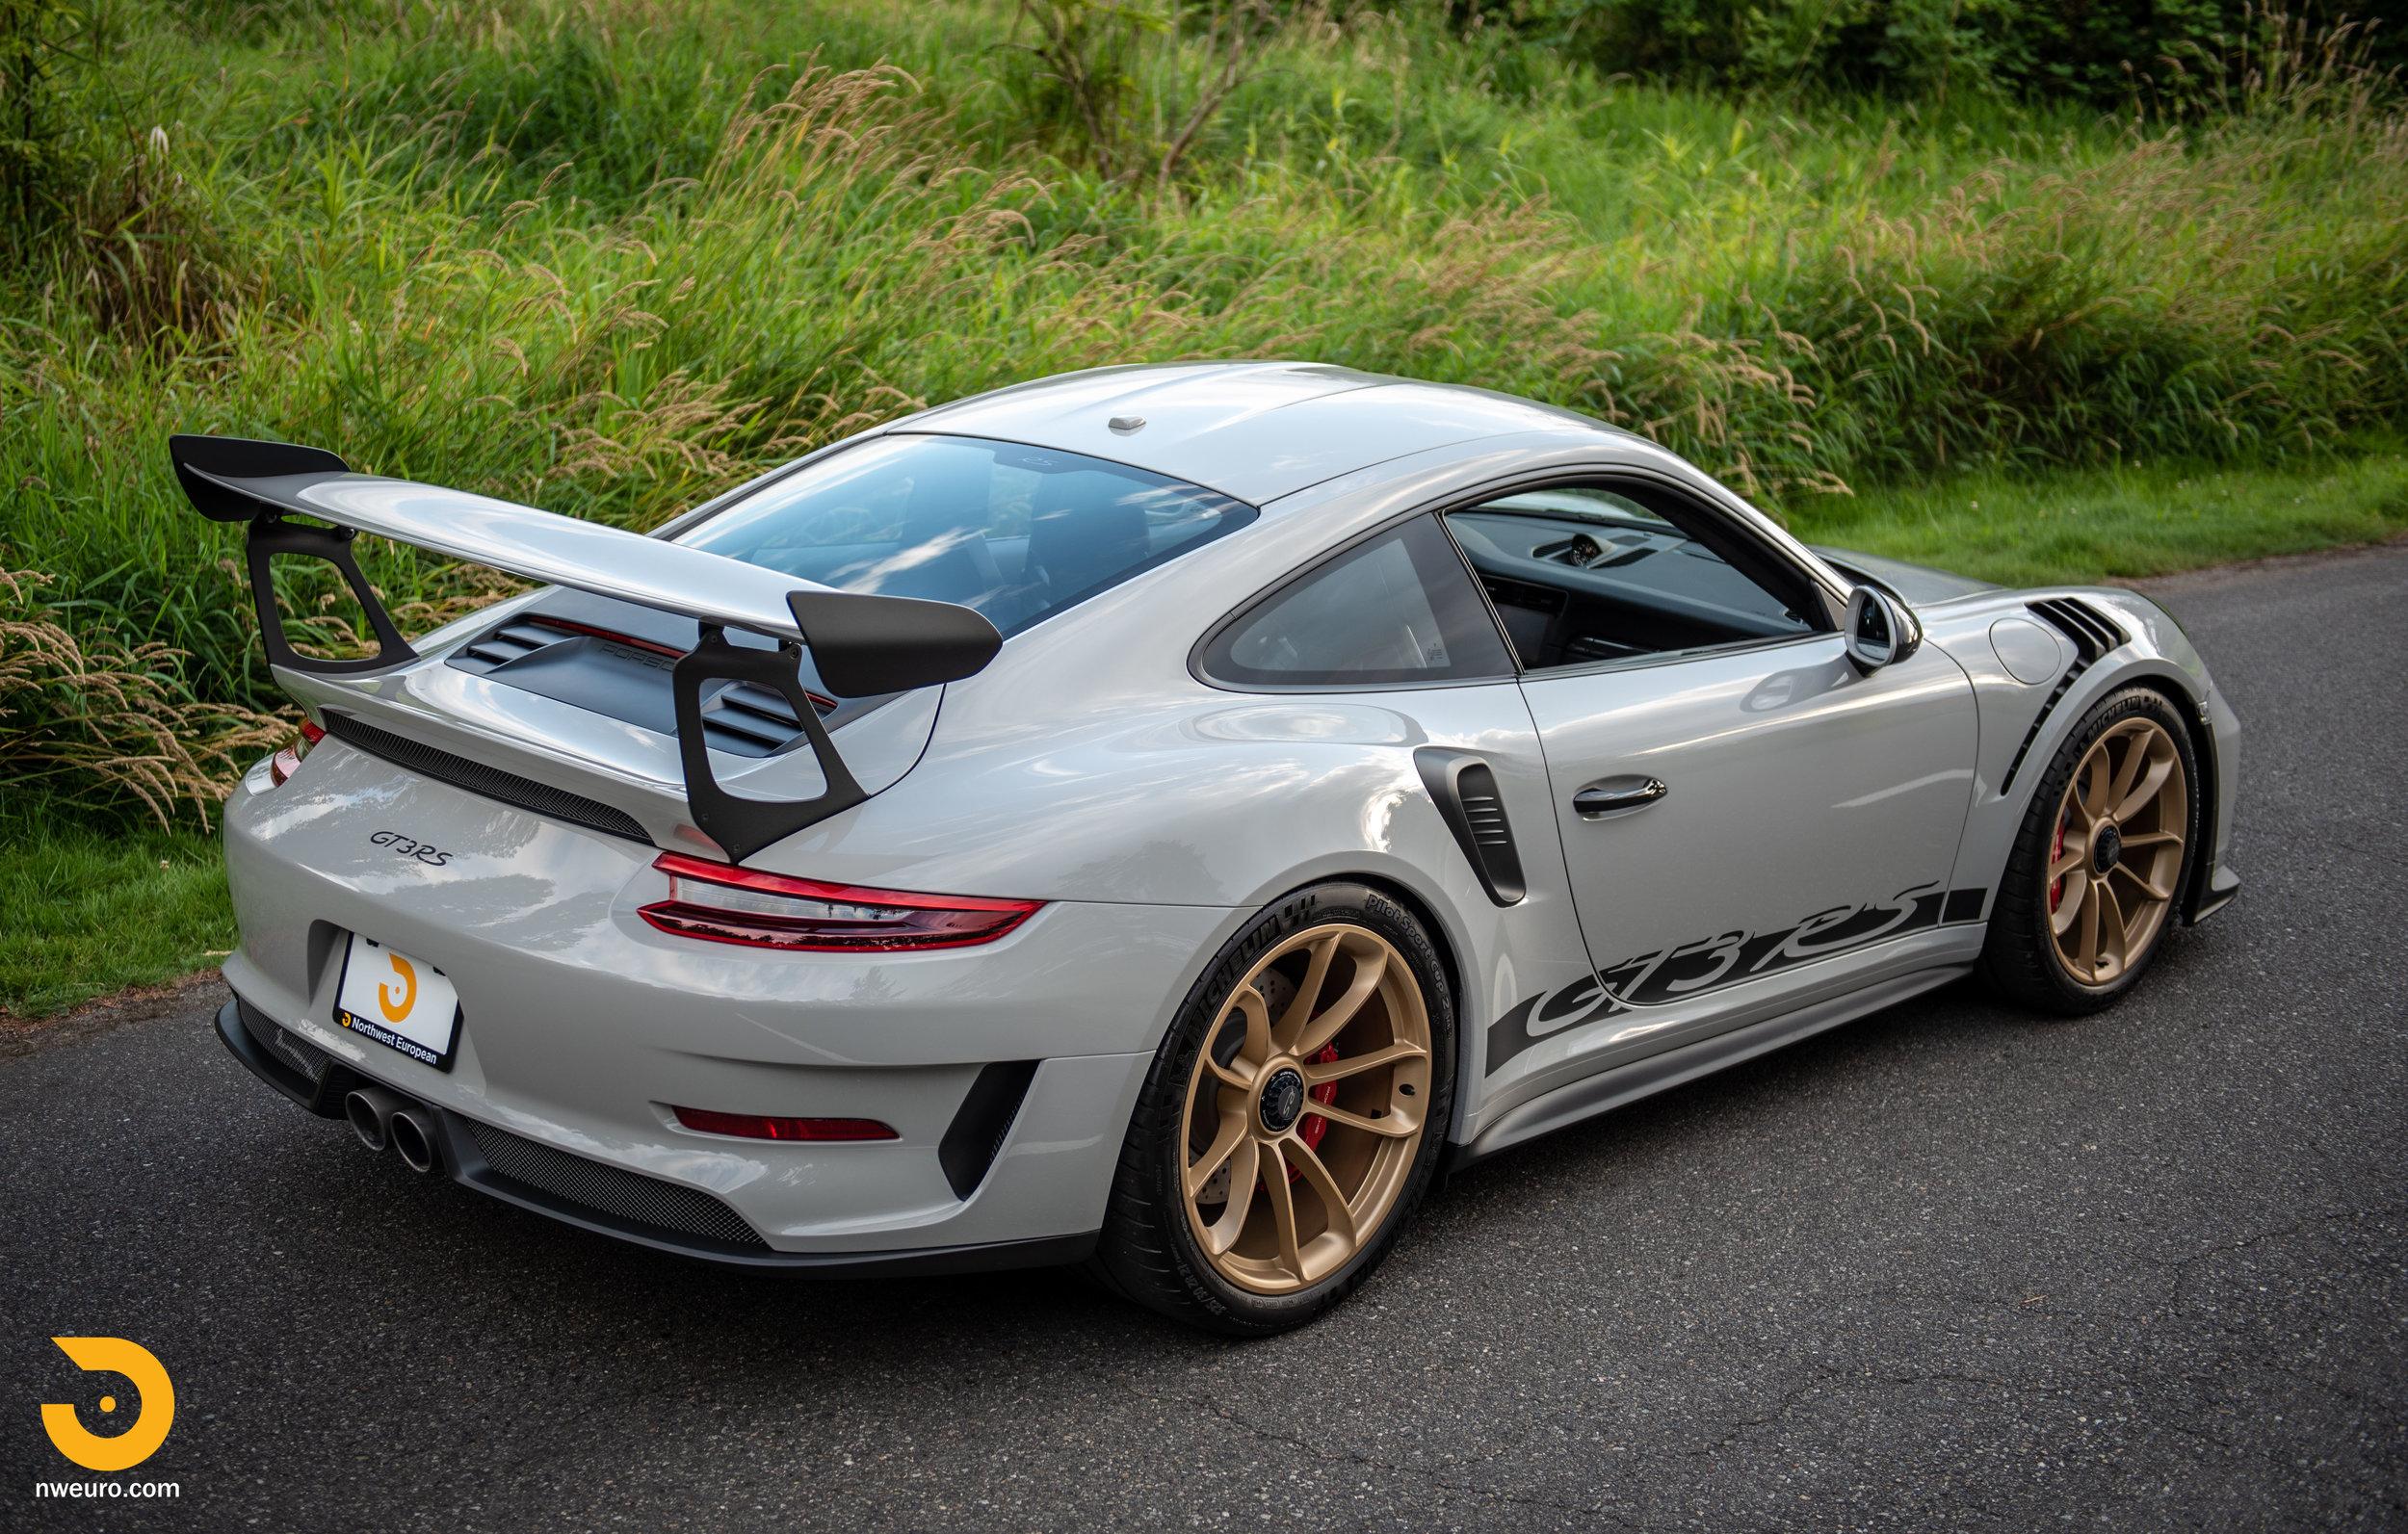 2019 Porsche GT3 RS - Chalk-58.jpg